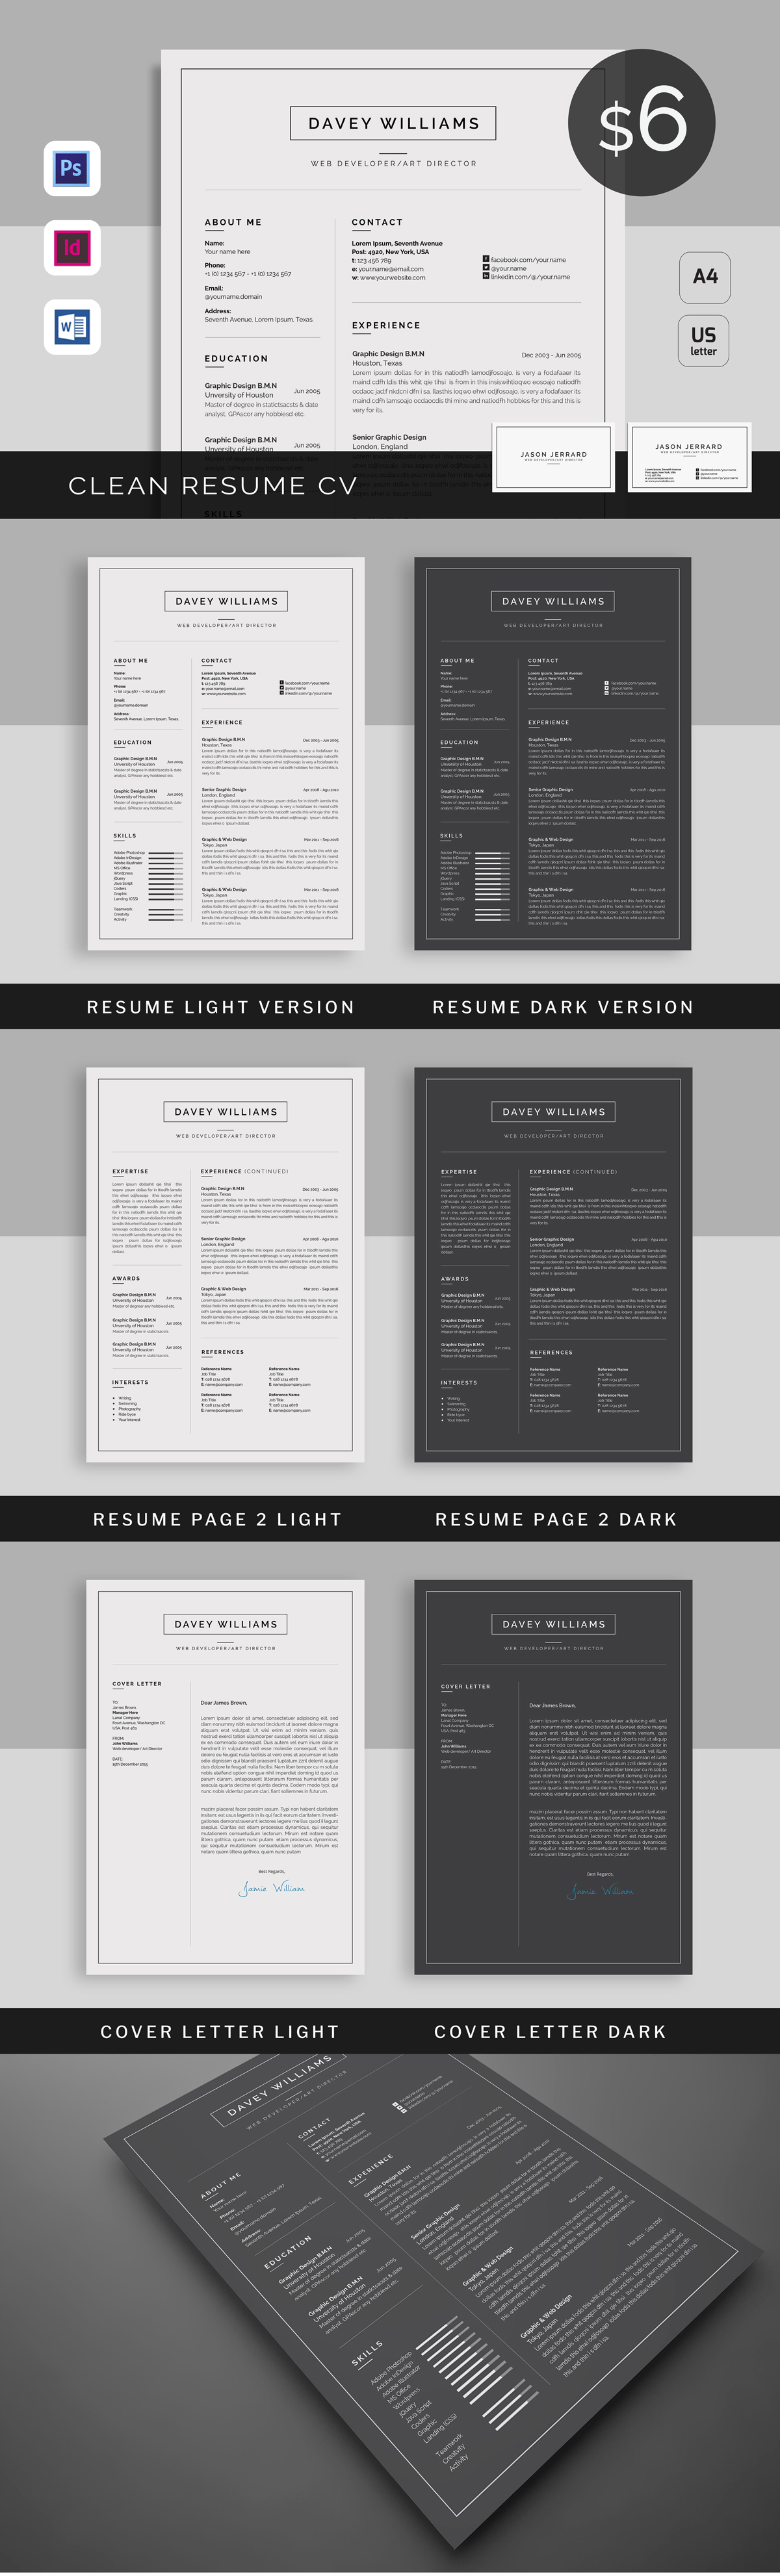 Resume/CV Template PSD, INDD Resume cv, Resume, Resume